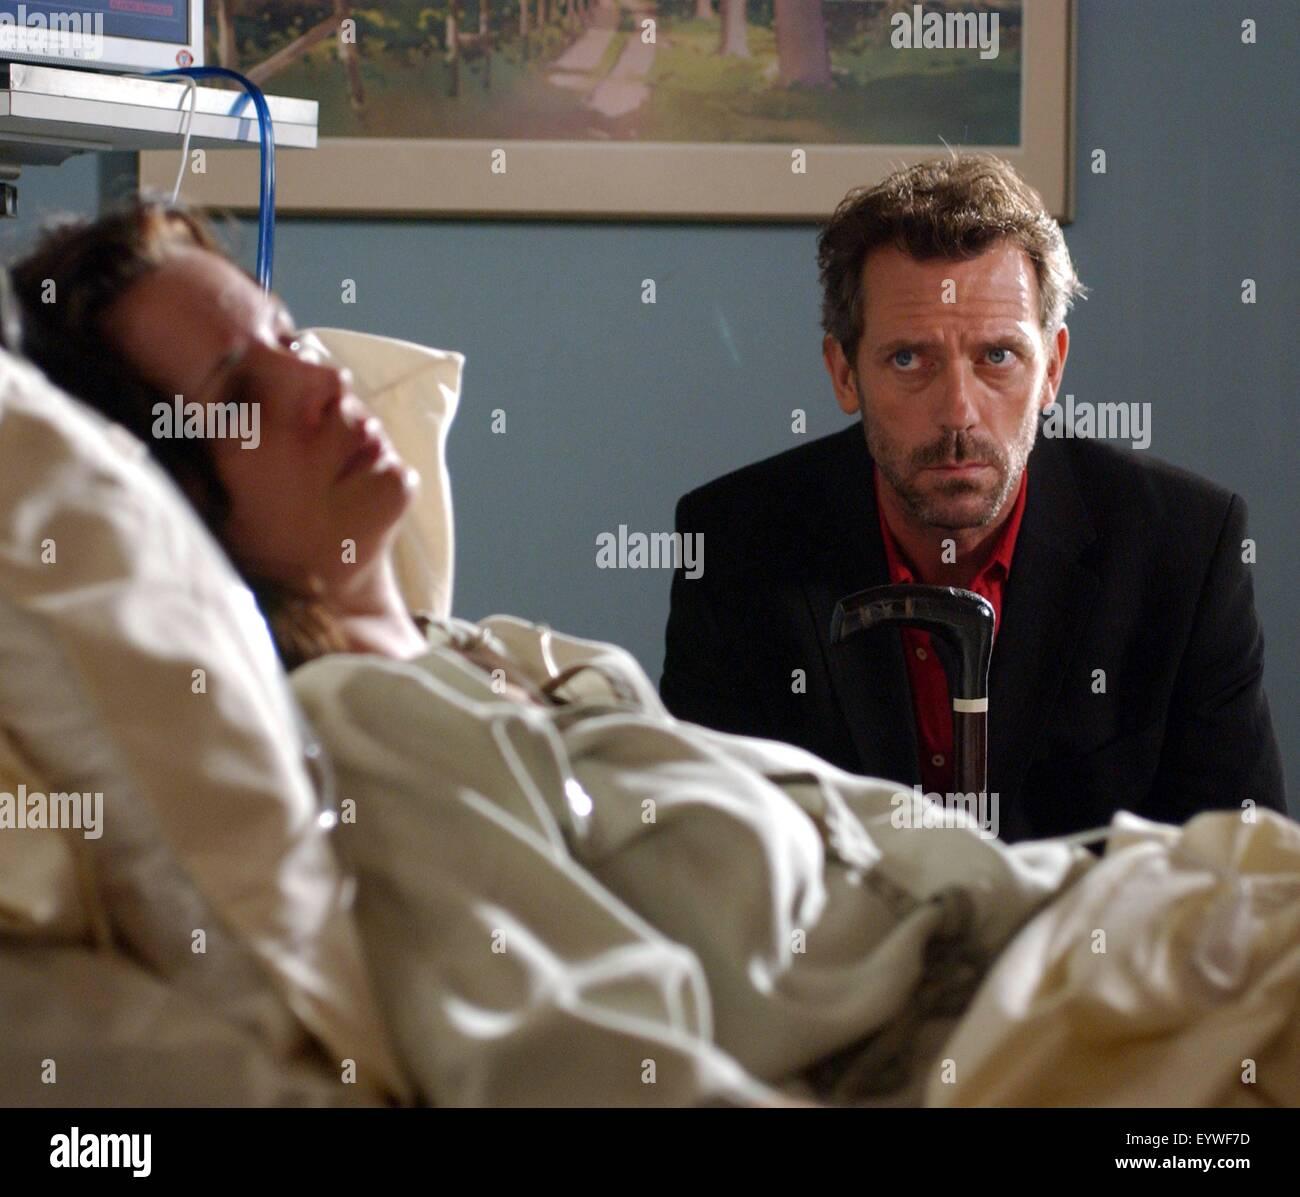 House M.D. ; TV Series 2004   ???? USA ; 2004 Season 1, Episode 6: The  Socratic Method ; Director : Peter Medak ; Stacy Edwards, Hugh Laurie, ...